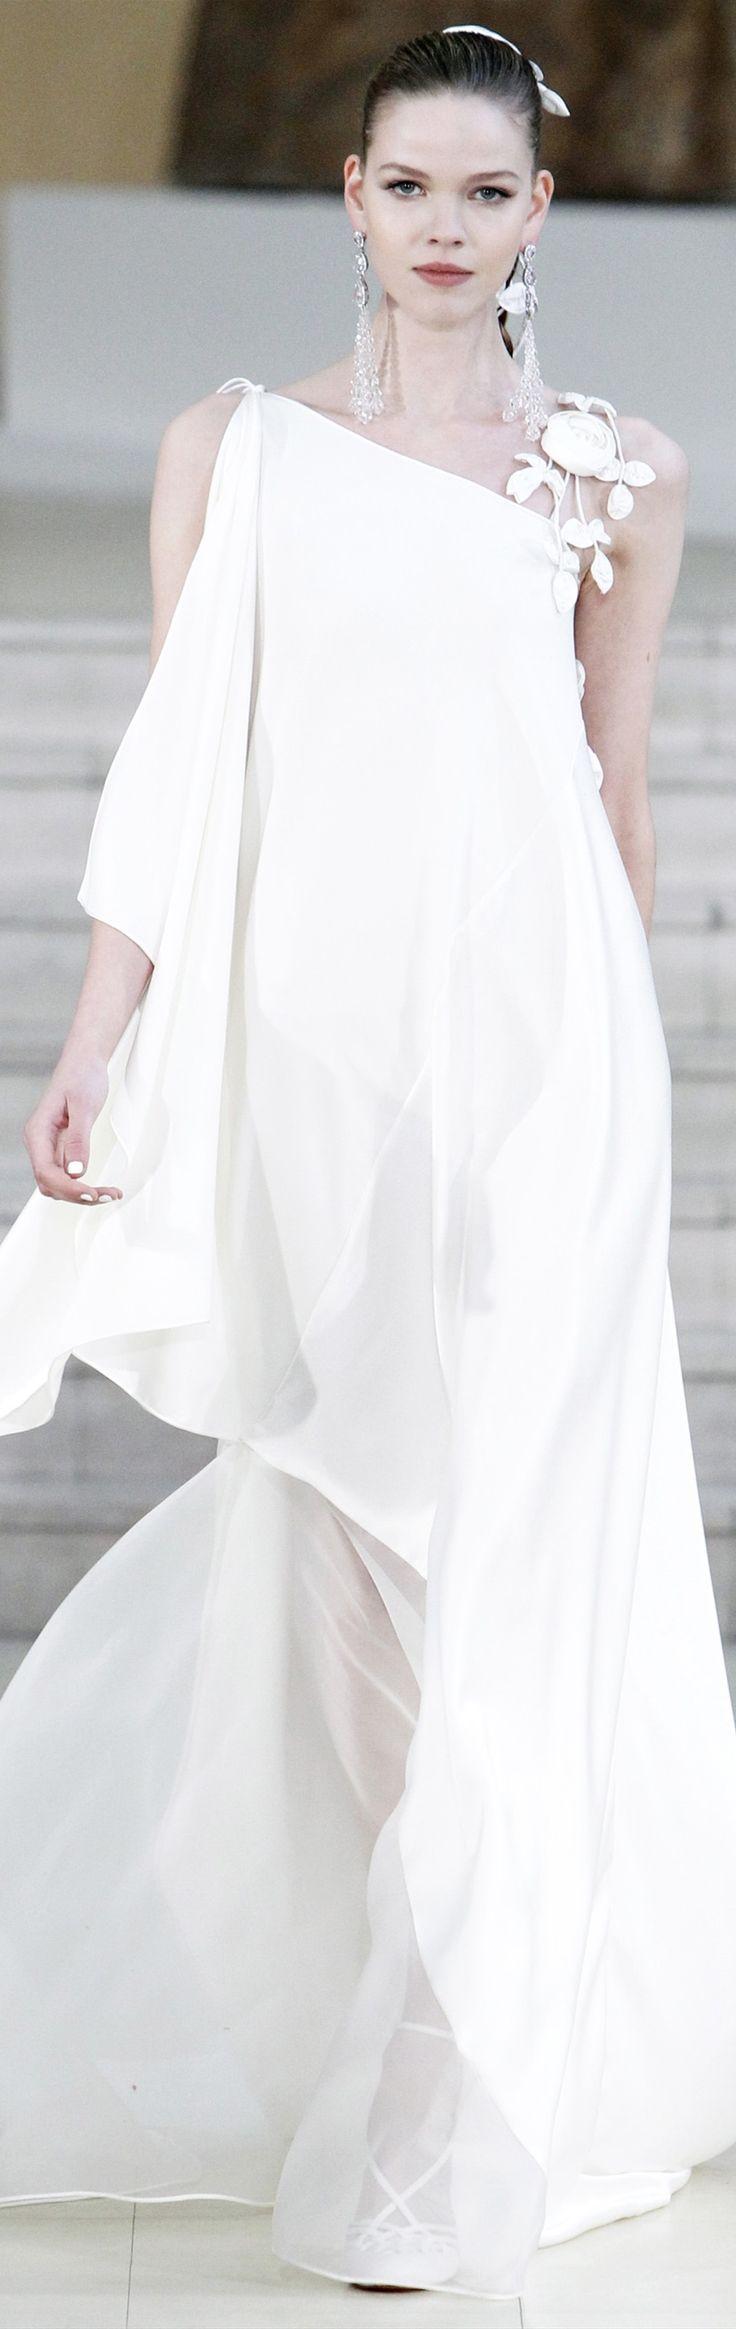 Alexis Mabille • WHITE • нαυтє • CHIC • ❤️ Babz™ ✿ιиѕριяαтισи❀ #abbigliamento